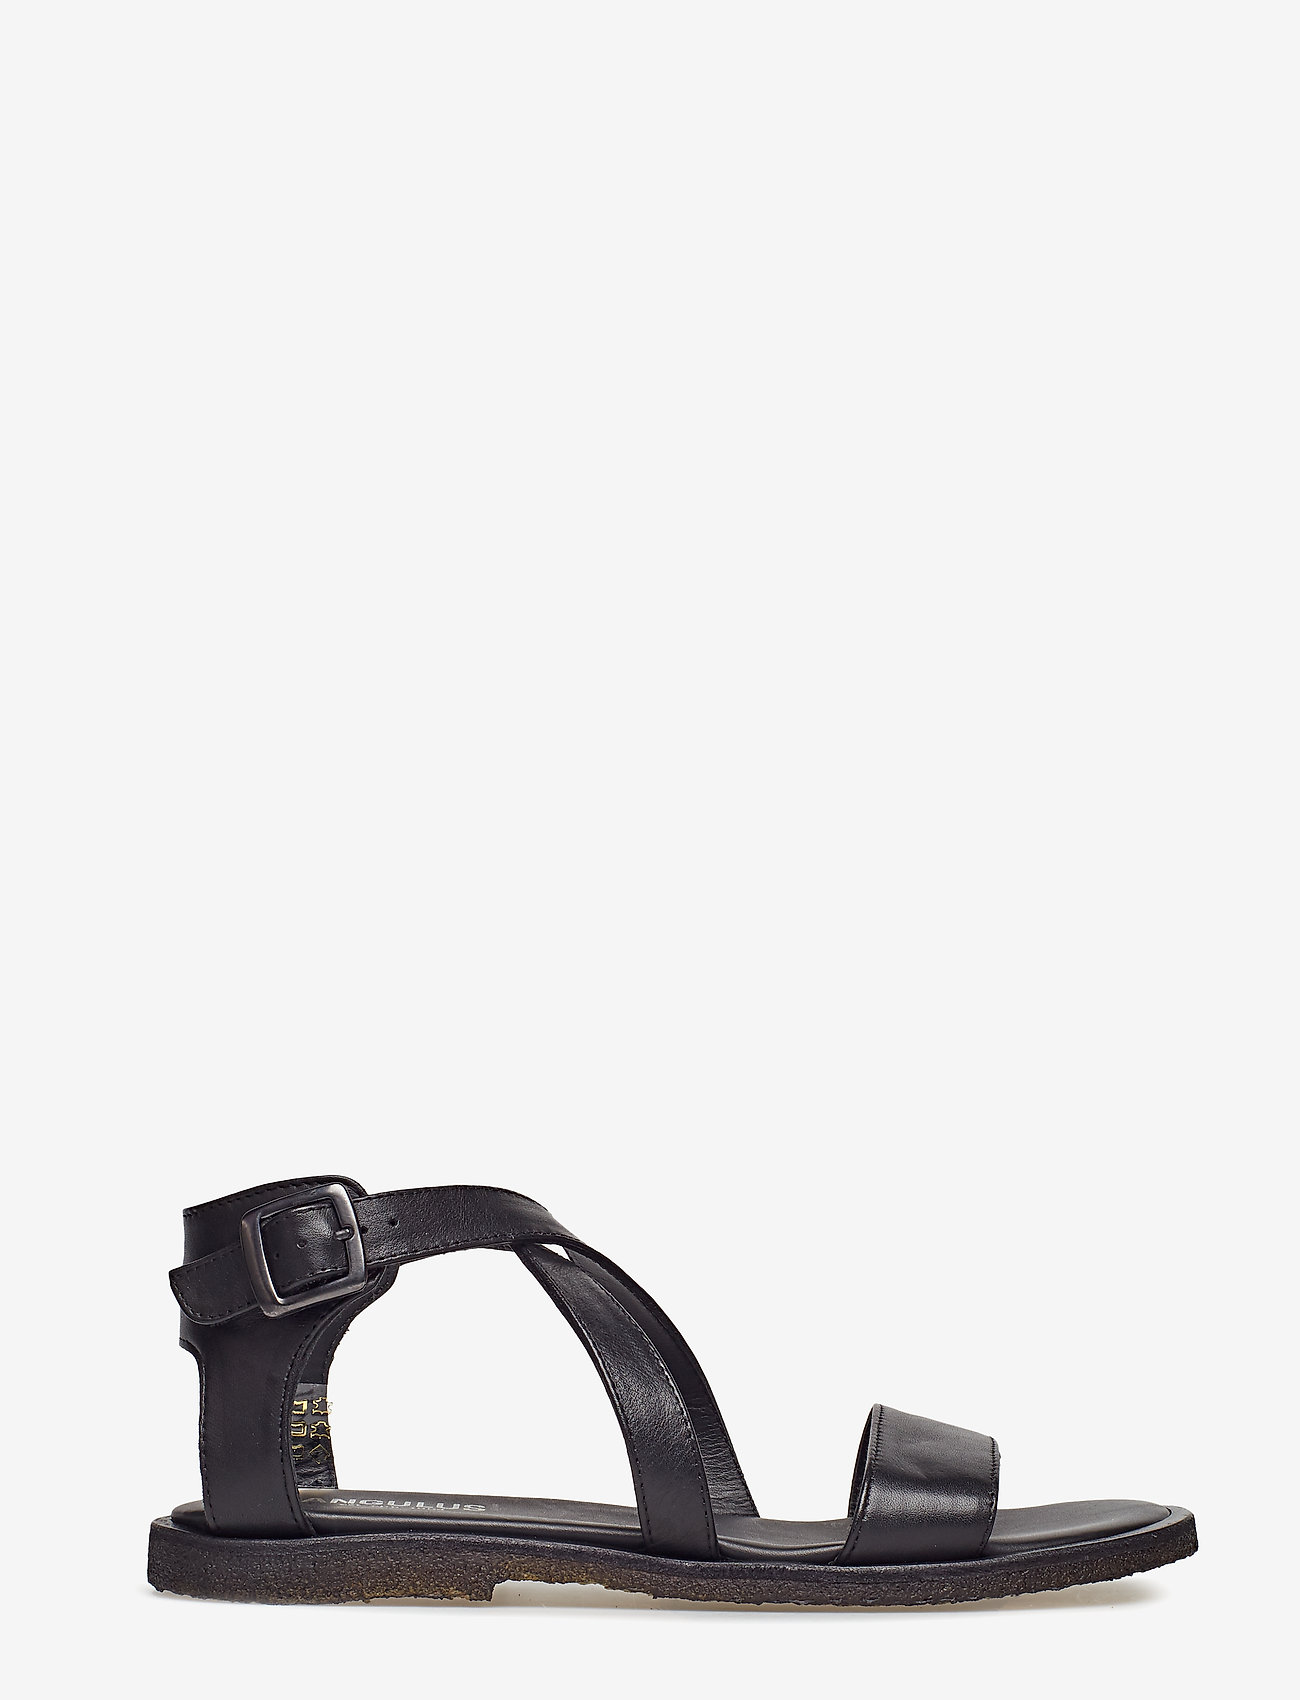 ANGULUS - 5442 - platte sandalen - 1604 black - 1